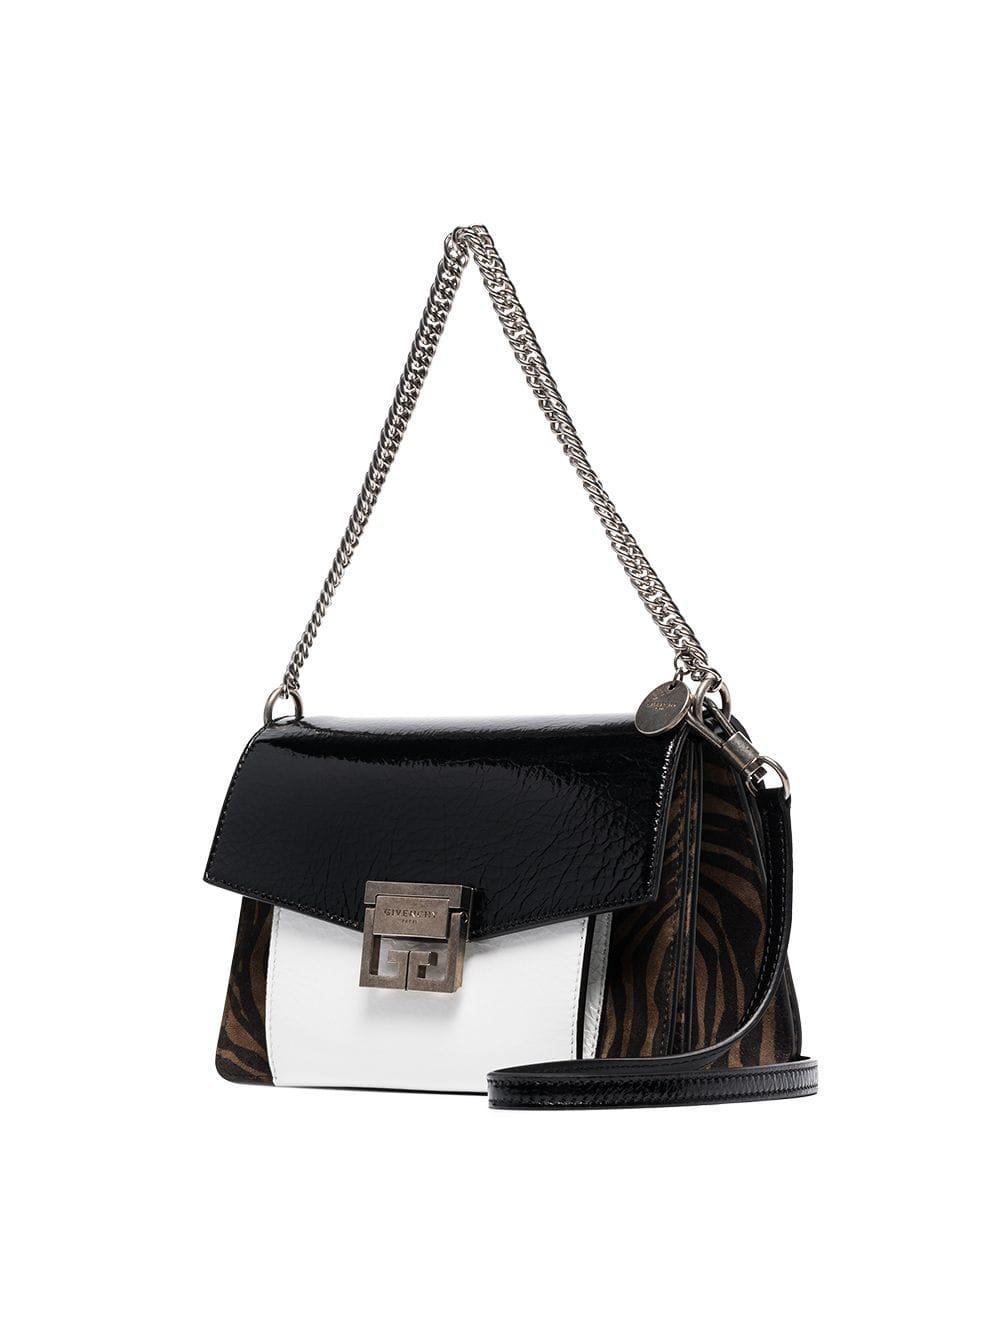 801a842eacb6 Givenchy - Black G3 Zebra Print Patent Leather Bag - Lyst. View fullscreen